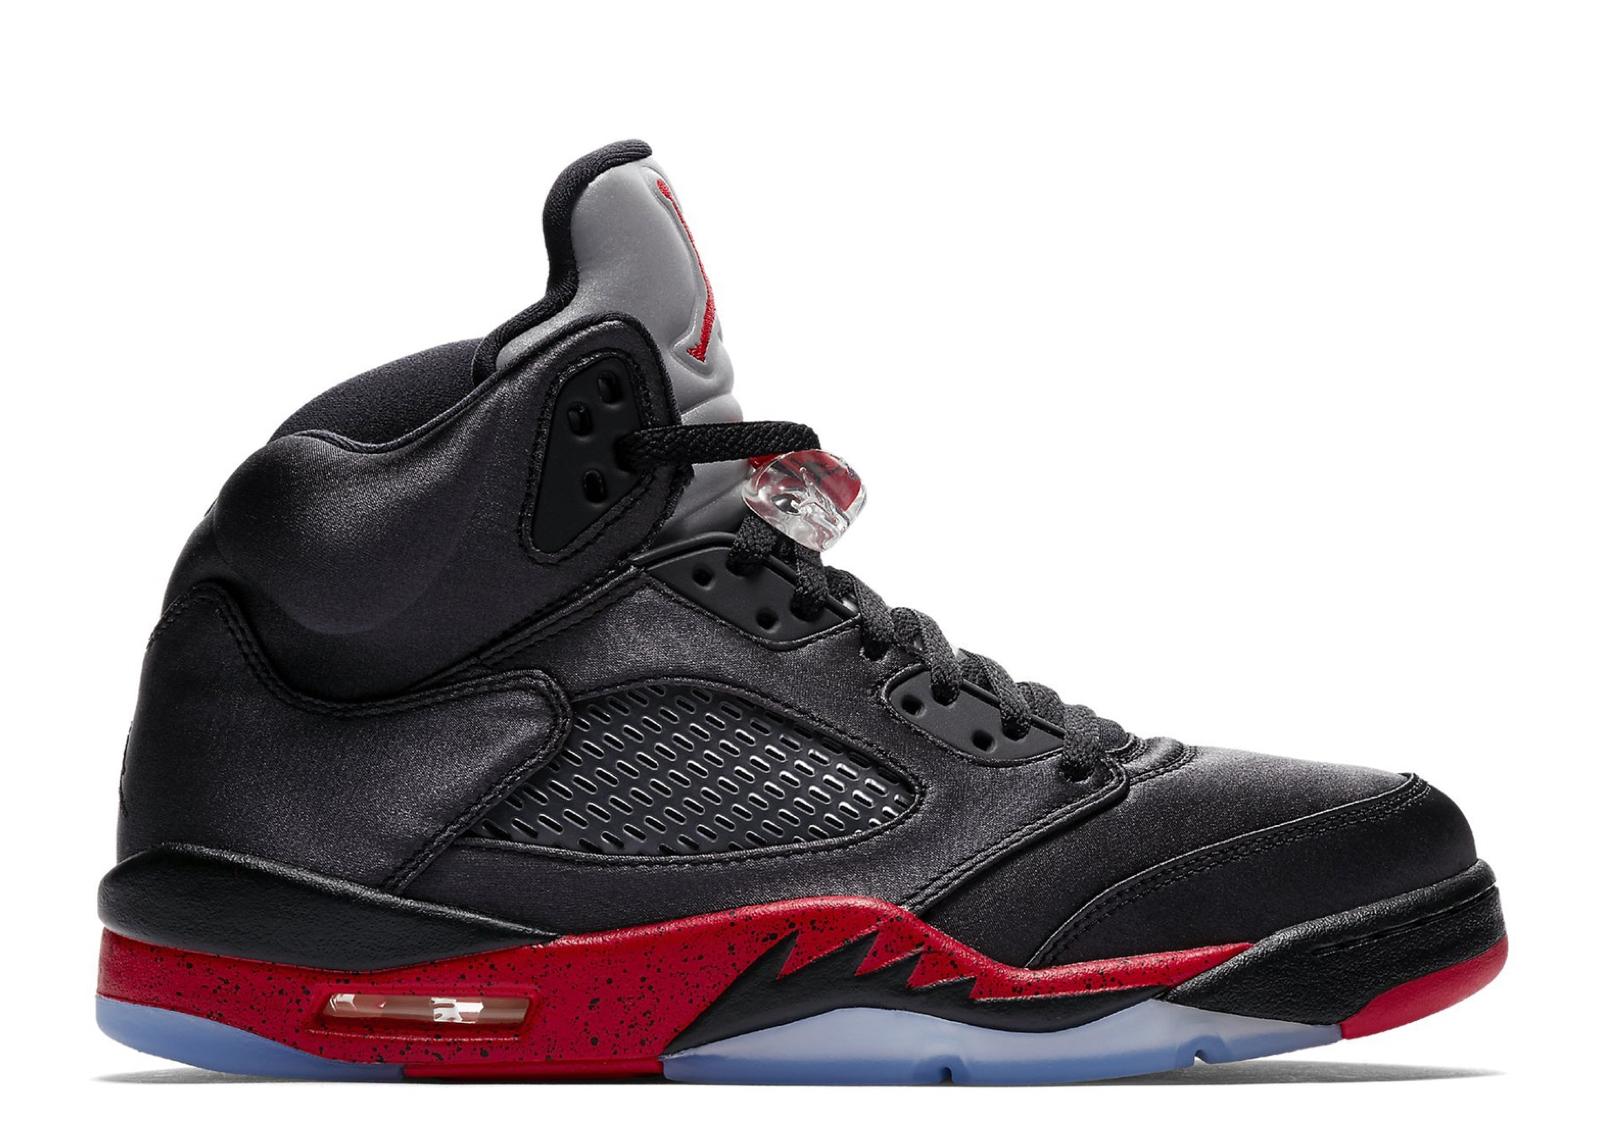 32497d9f30a0 Kick Avenue - Authentic Sneakers